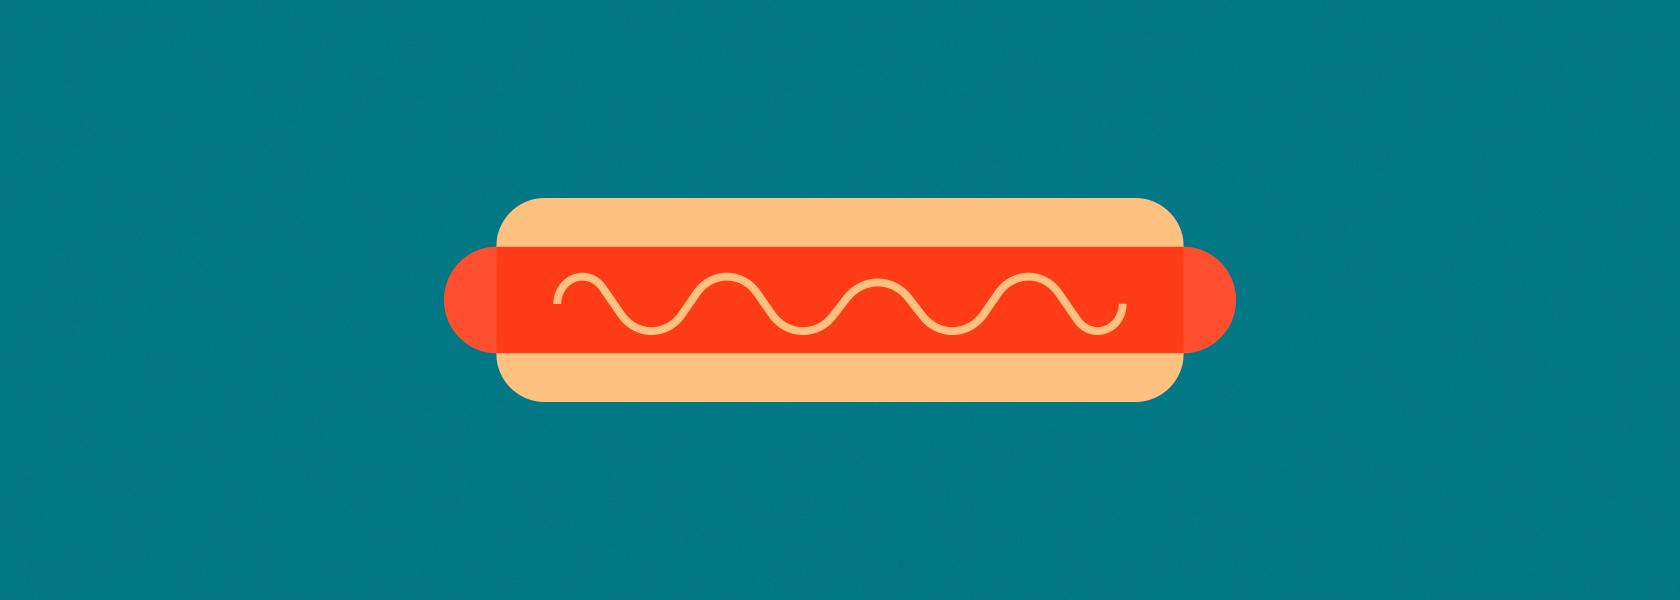 tame-brain-hotdog